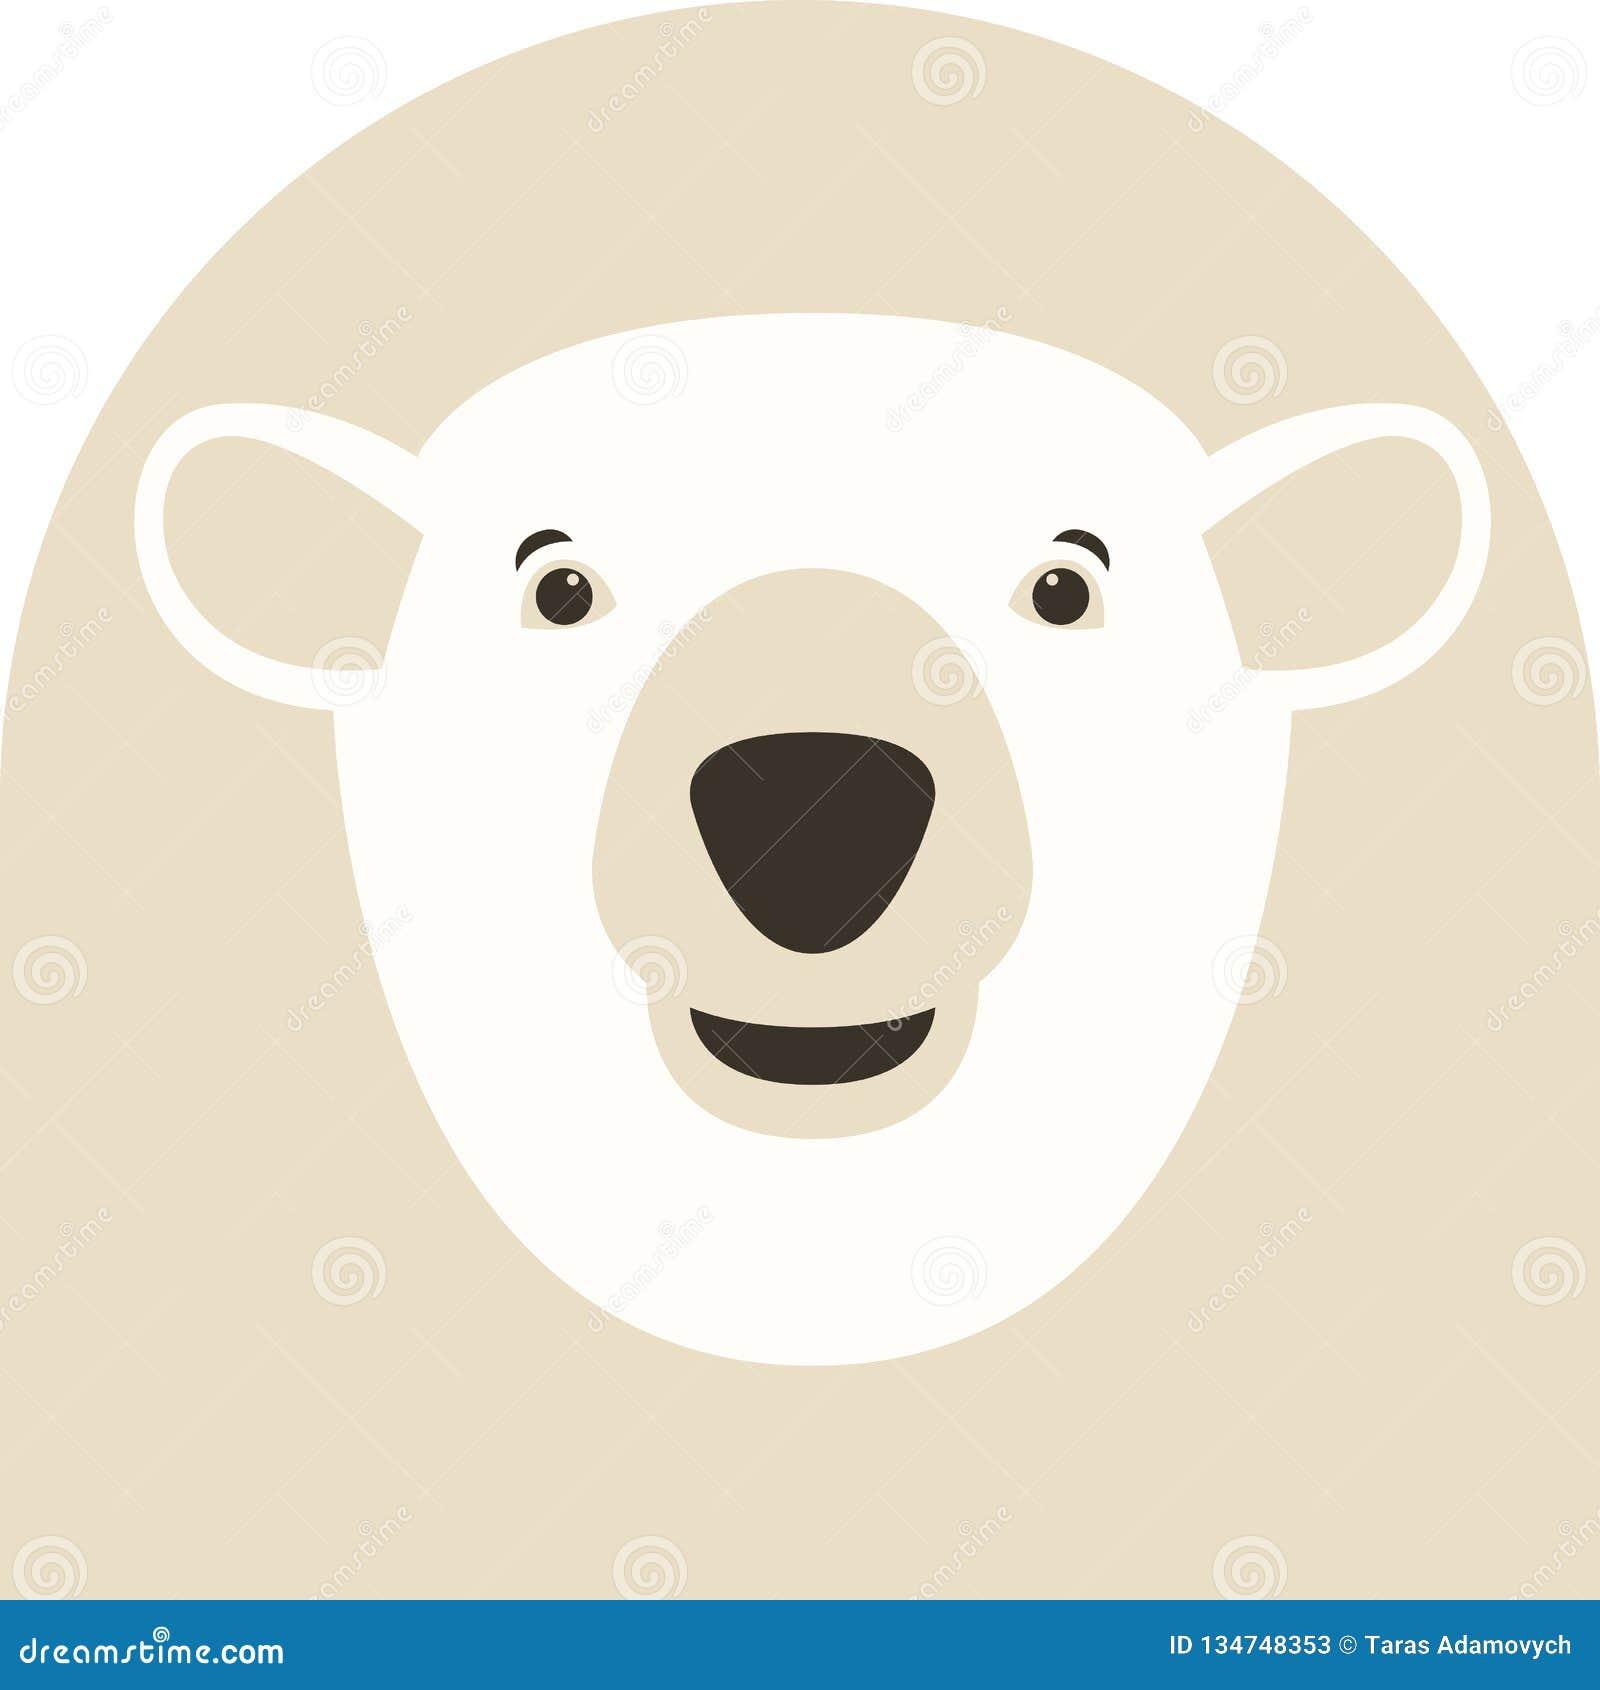 Free Origami Polar Bear Tutorial   Origami kaarten, Winter ...   1689x1600